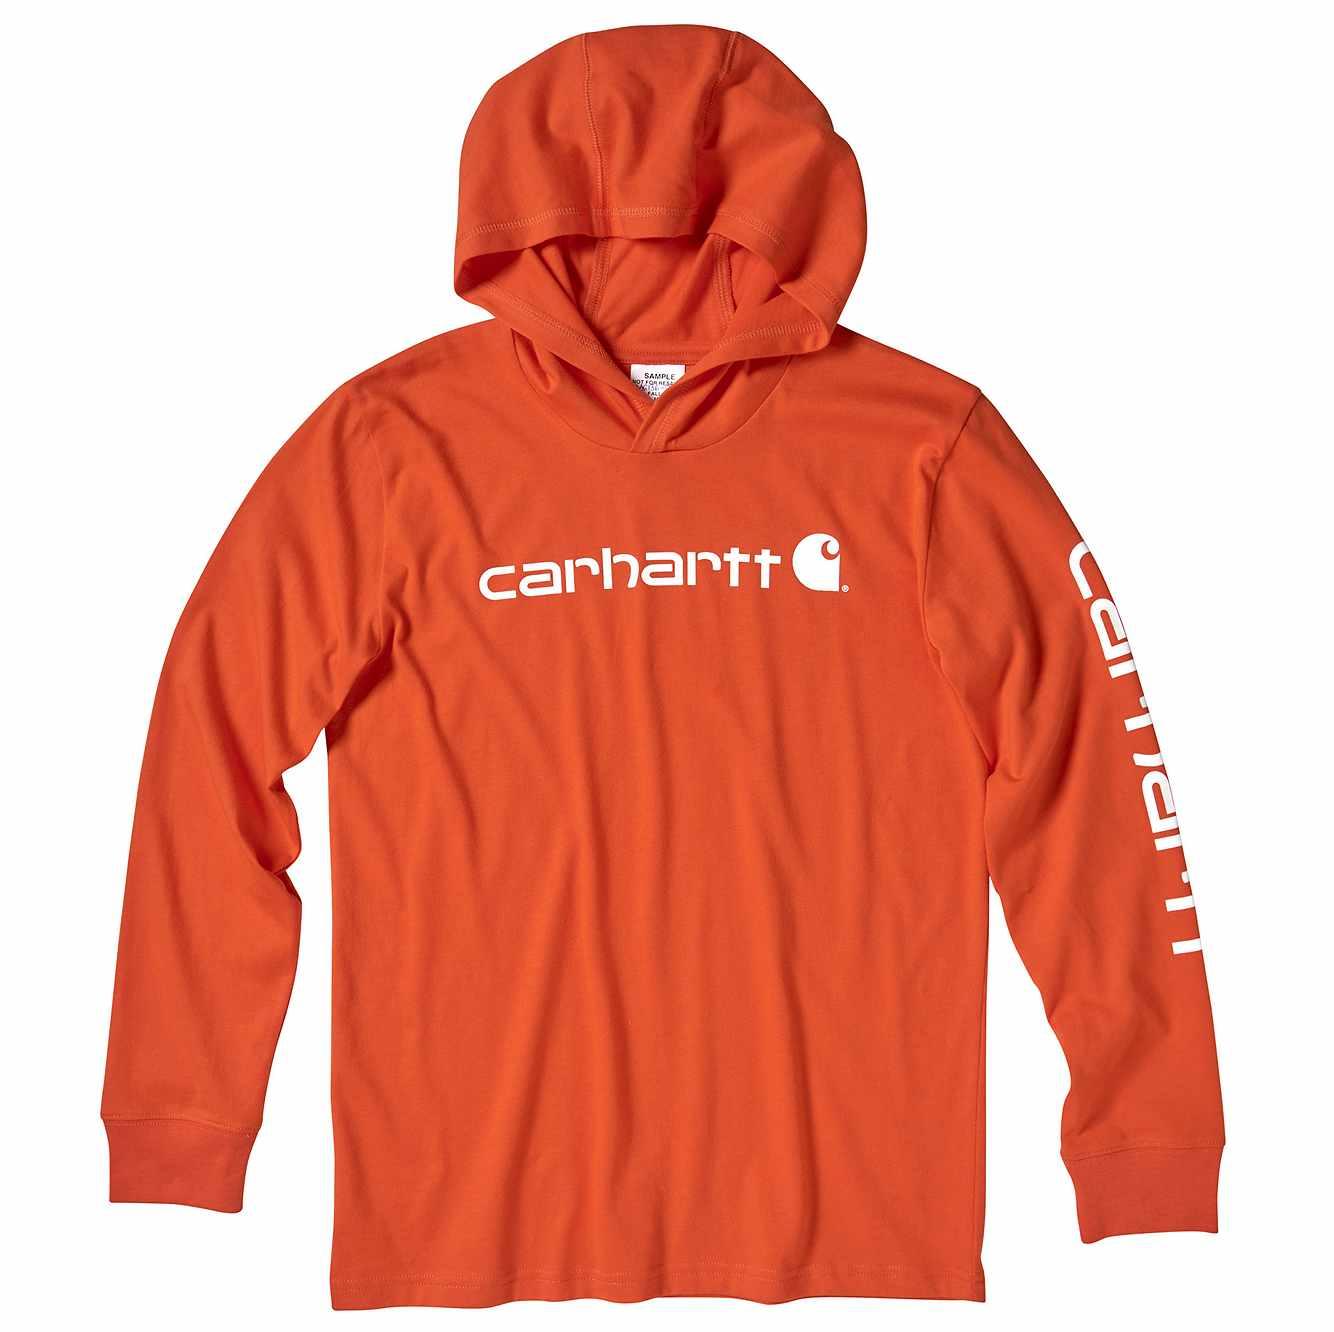 Picture of Long Sleeve Hooded Tee in Carhartt Blaze Orange